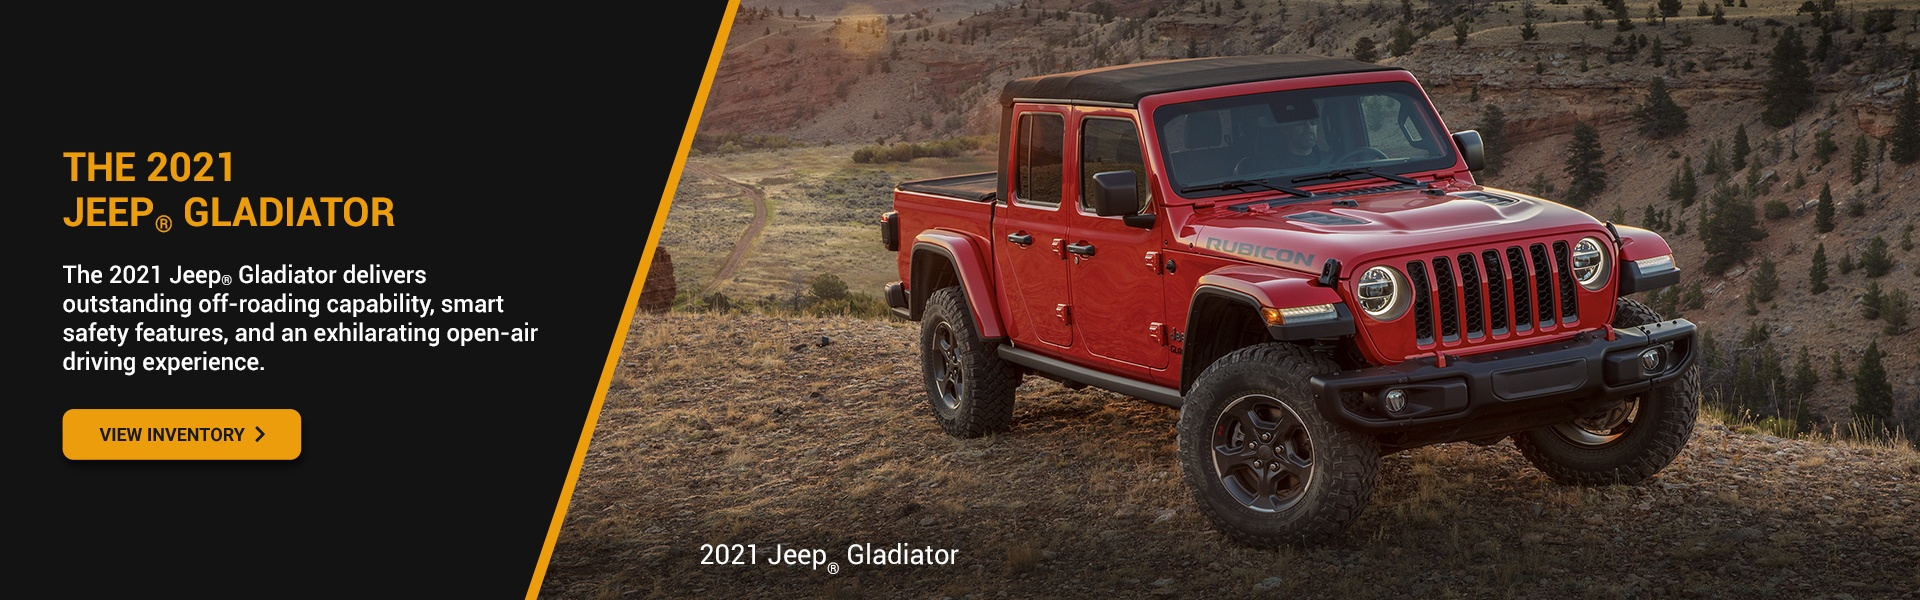 2021 Jeep Gladiator Promotional Banner